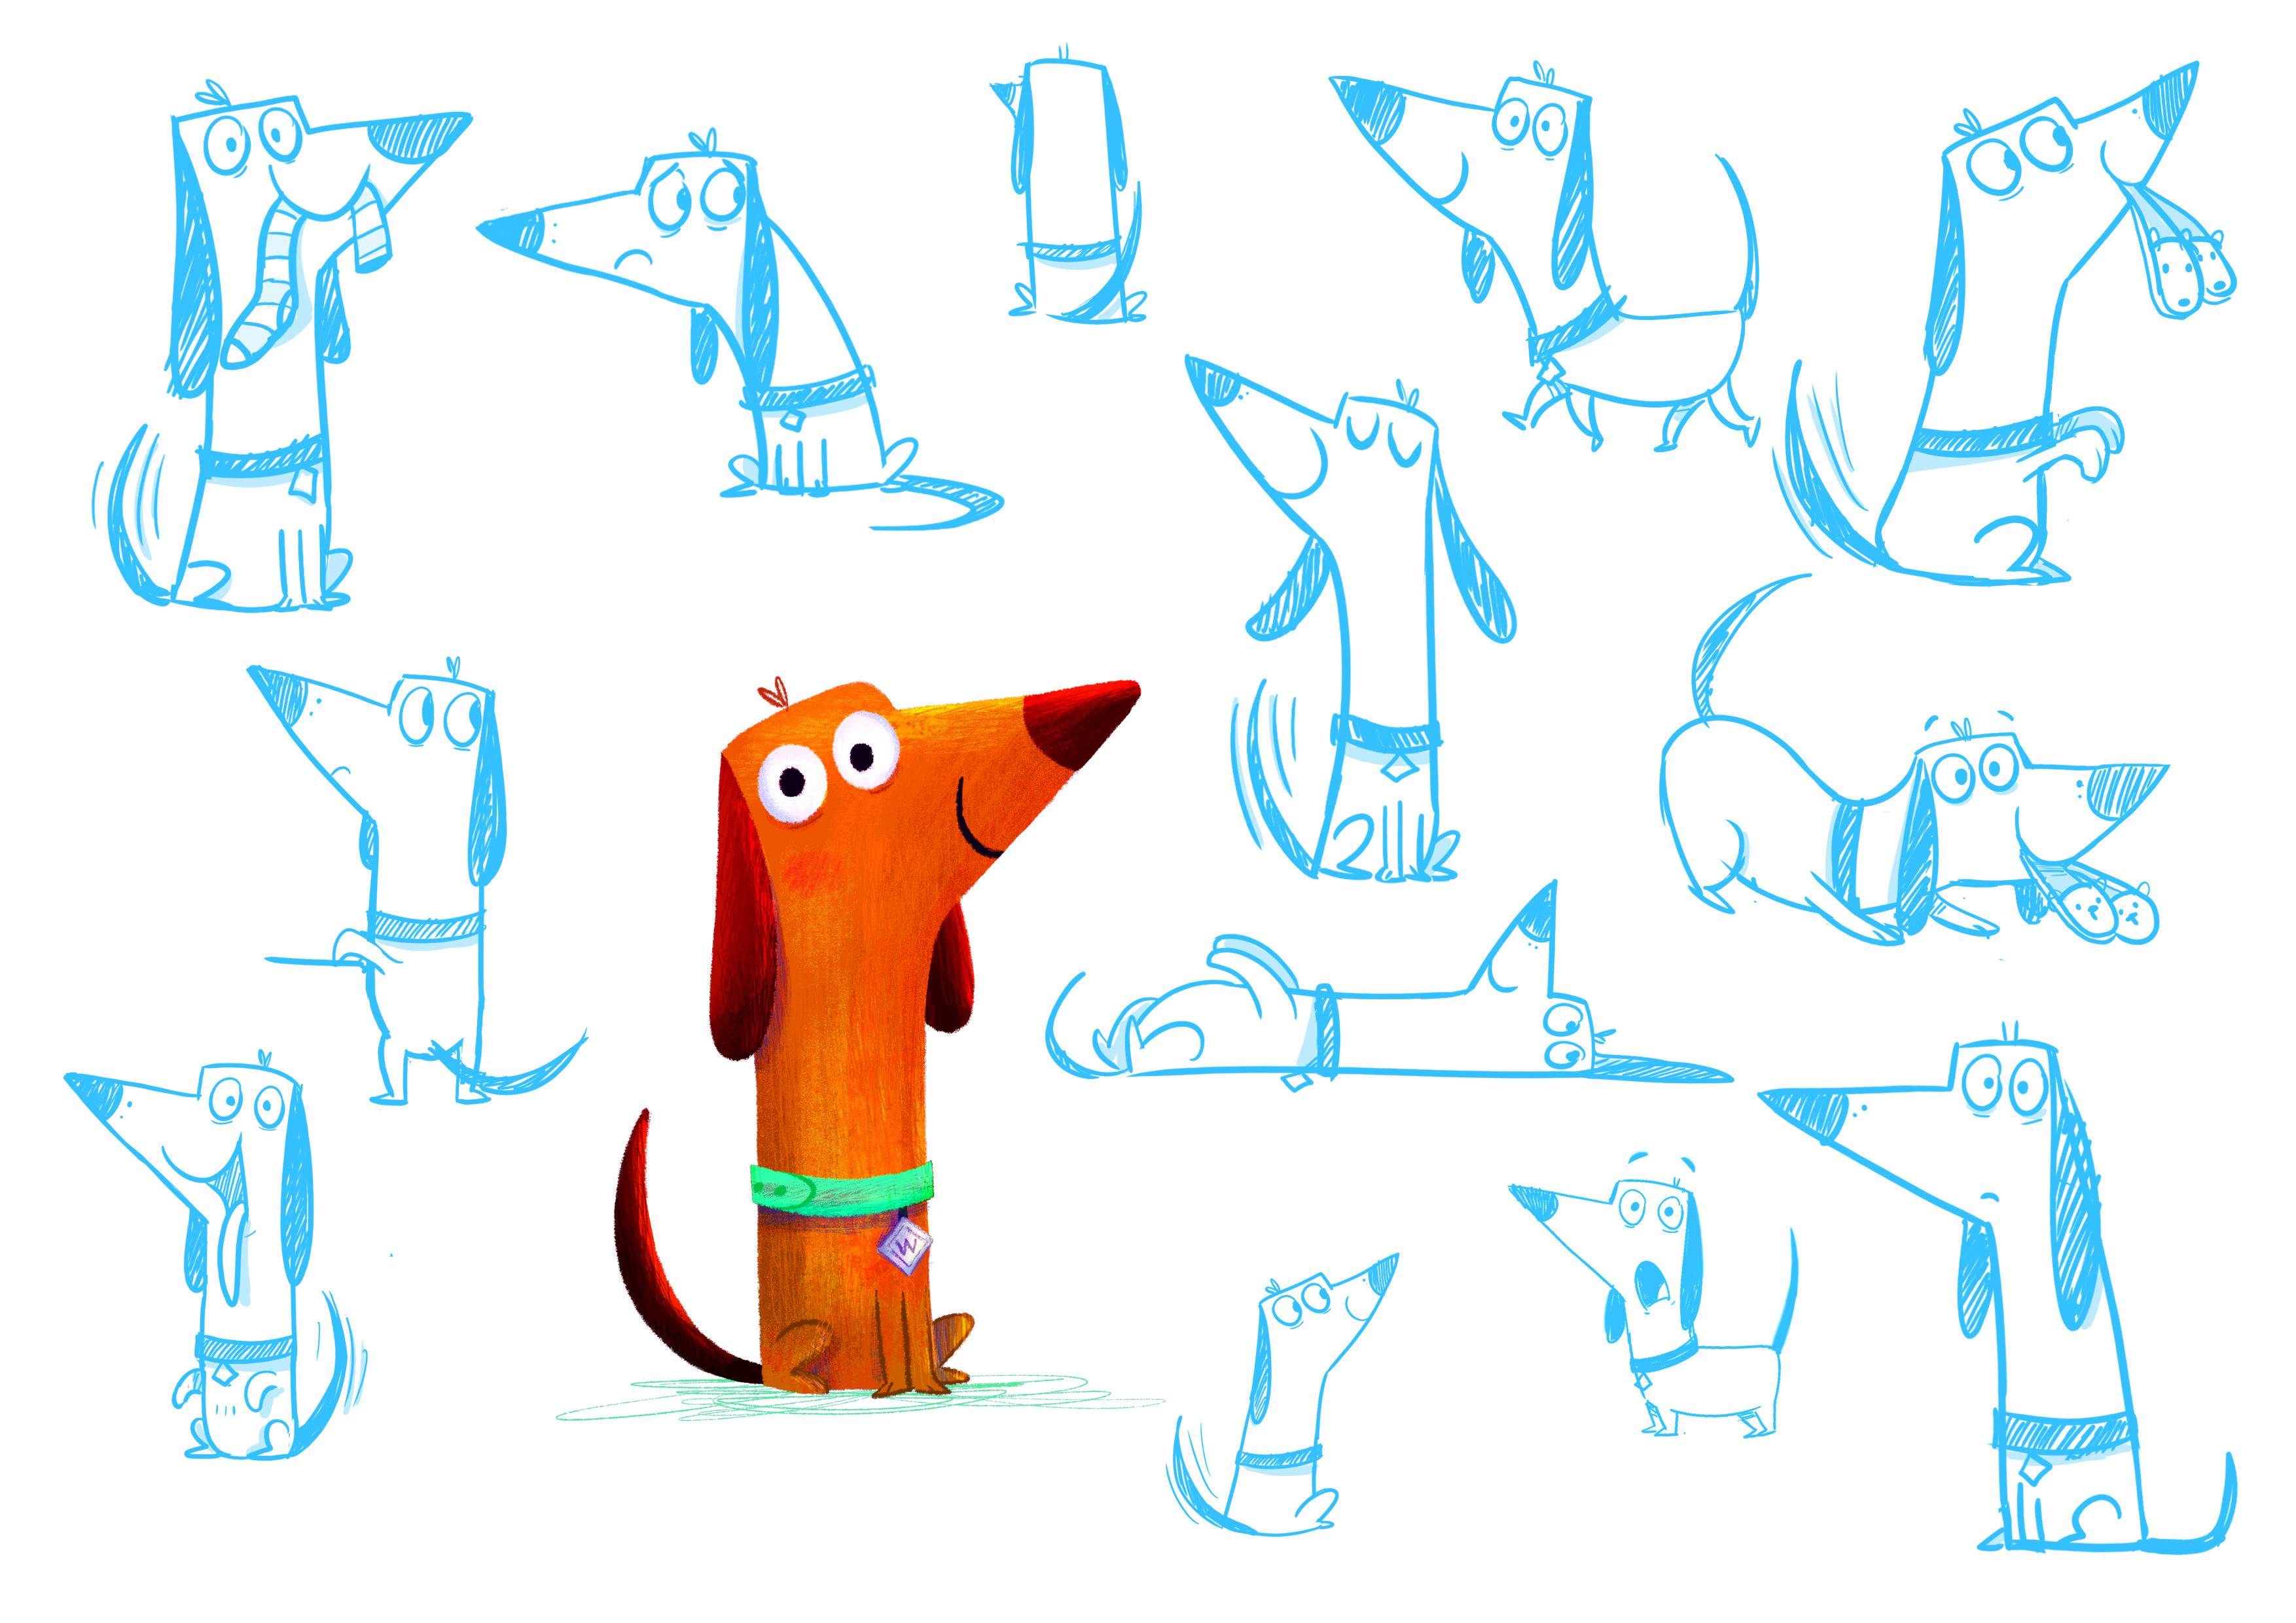 wilbur-character study